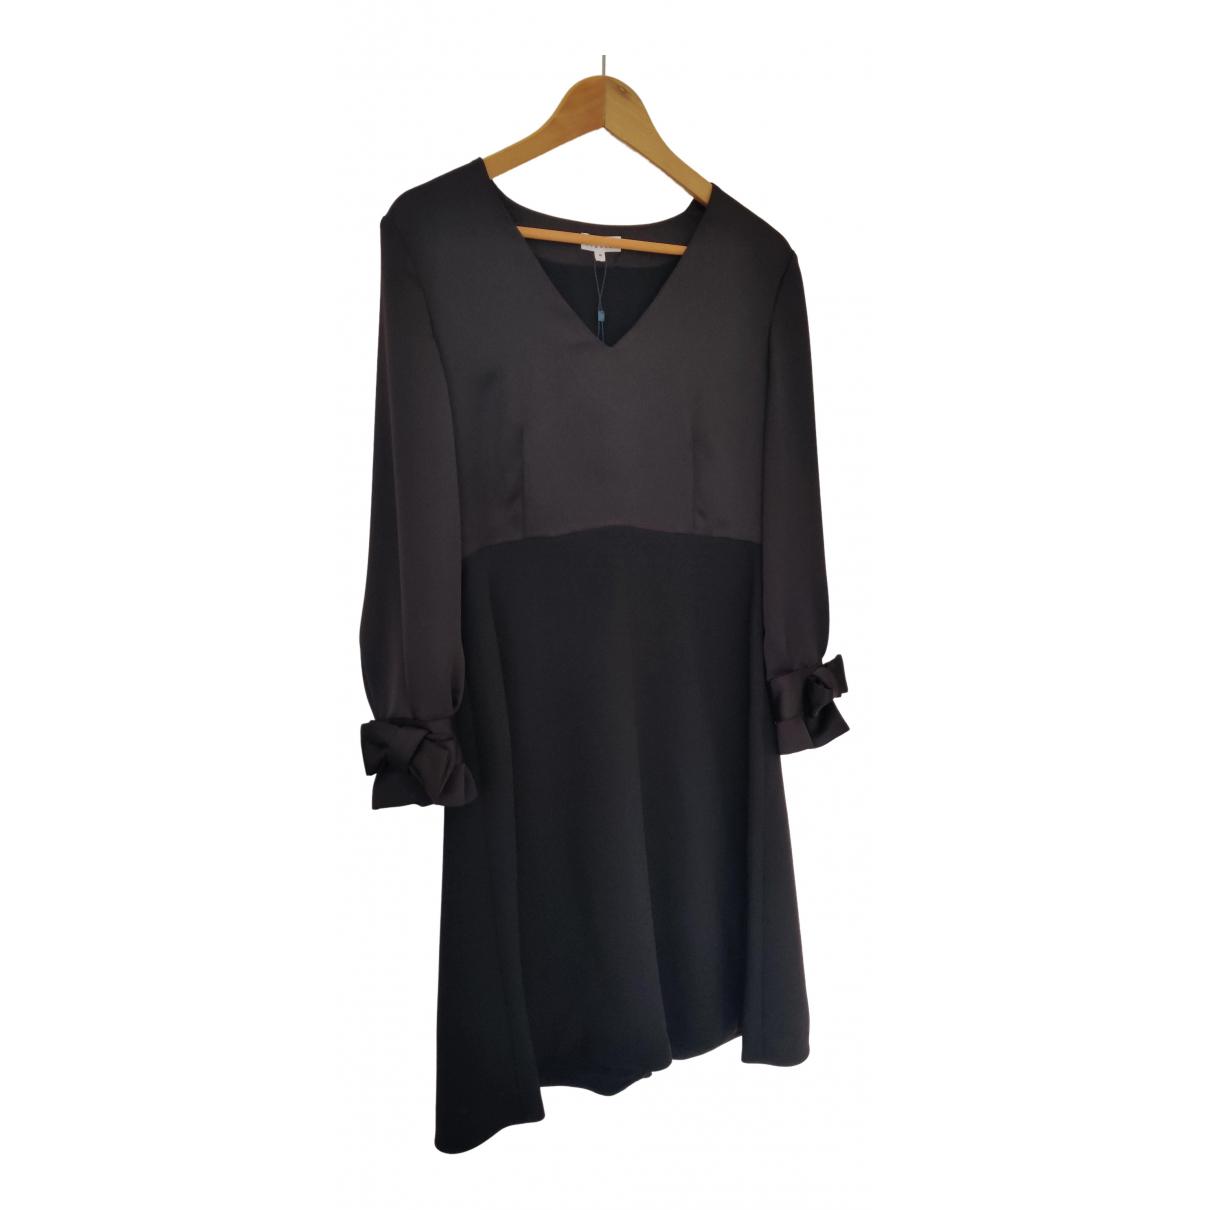 Claudie Pierlot \N Black dress for Women 38 FR